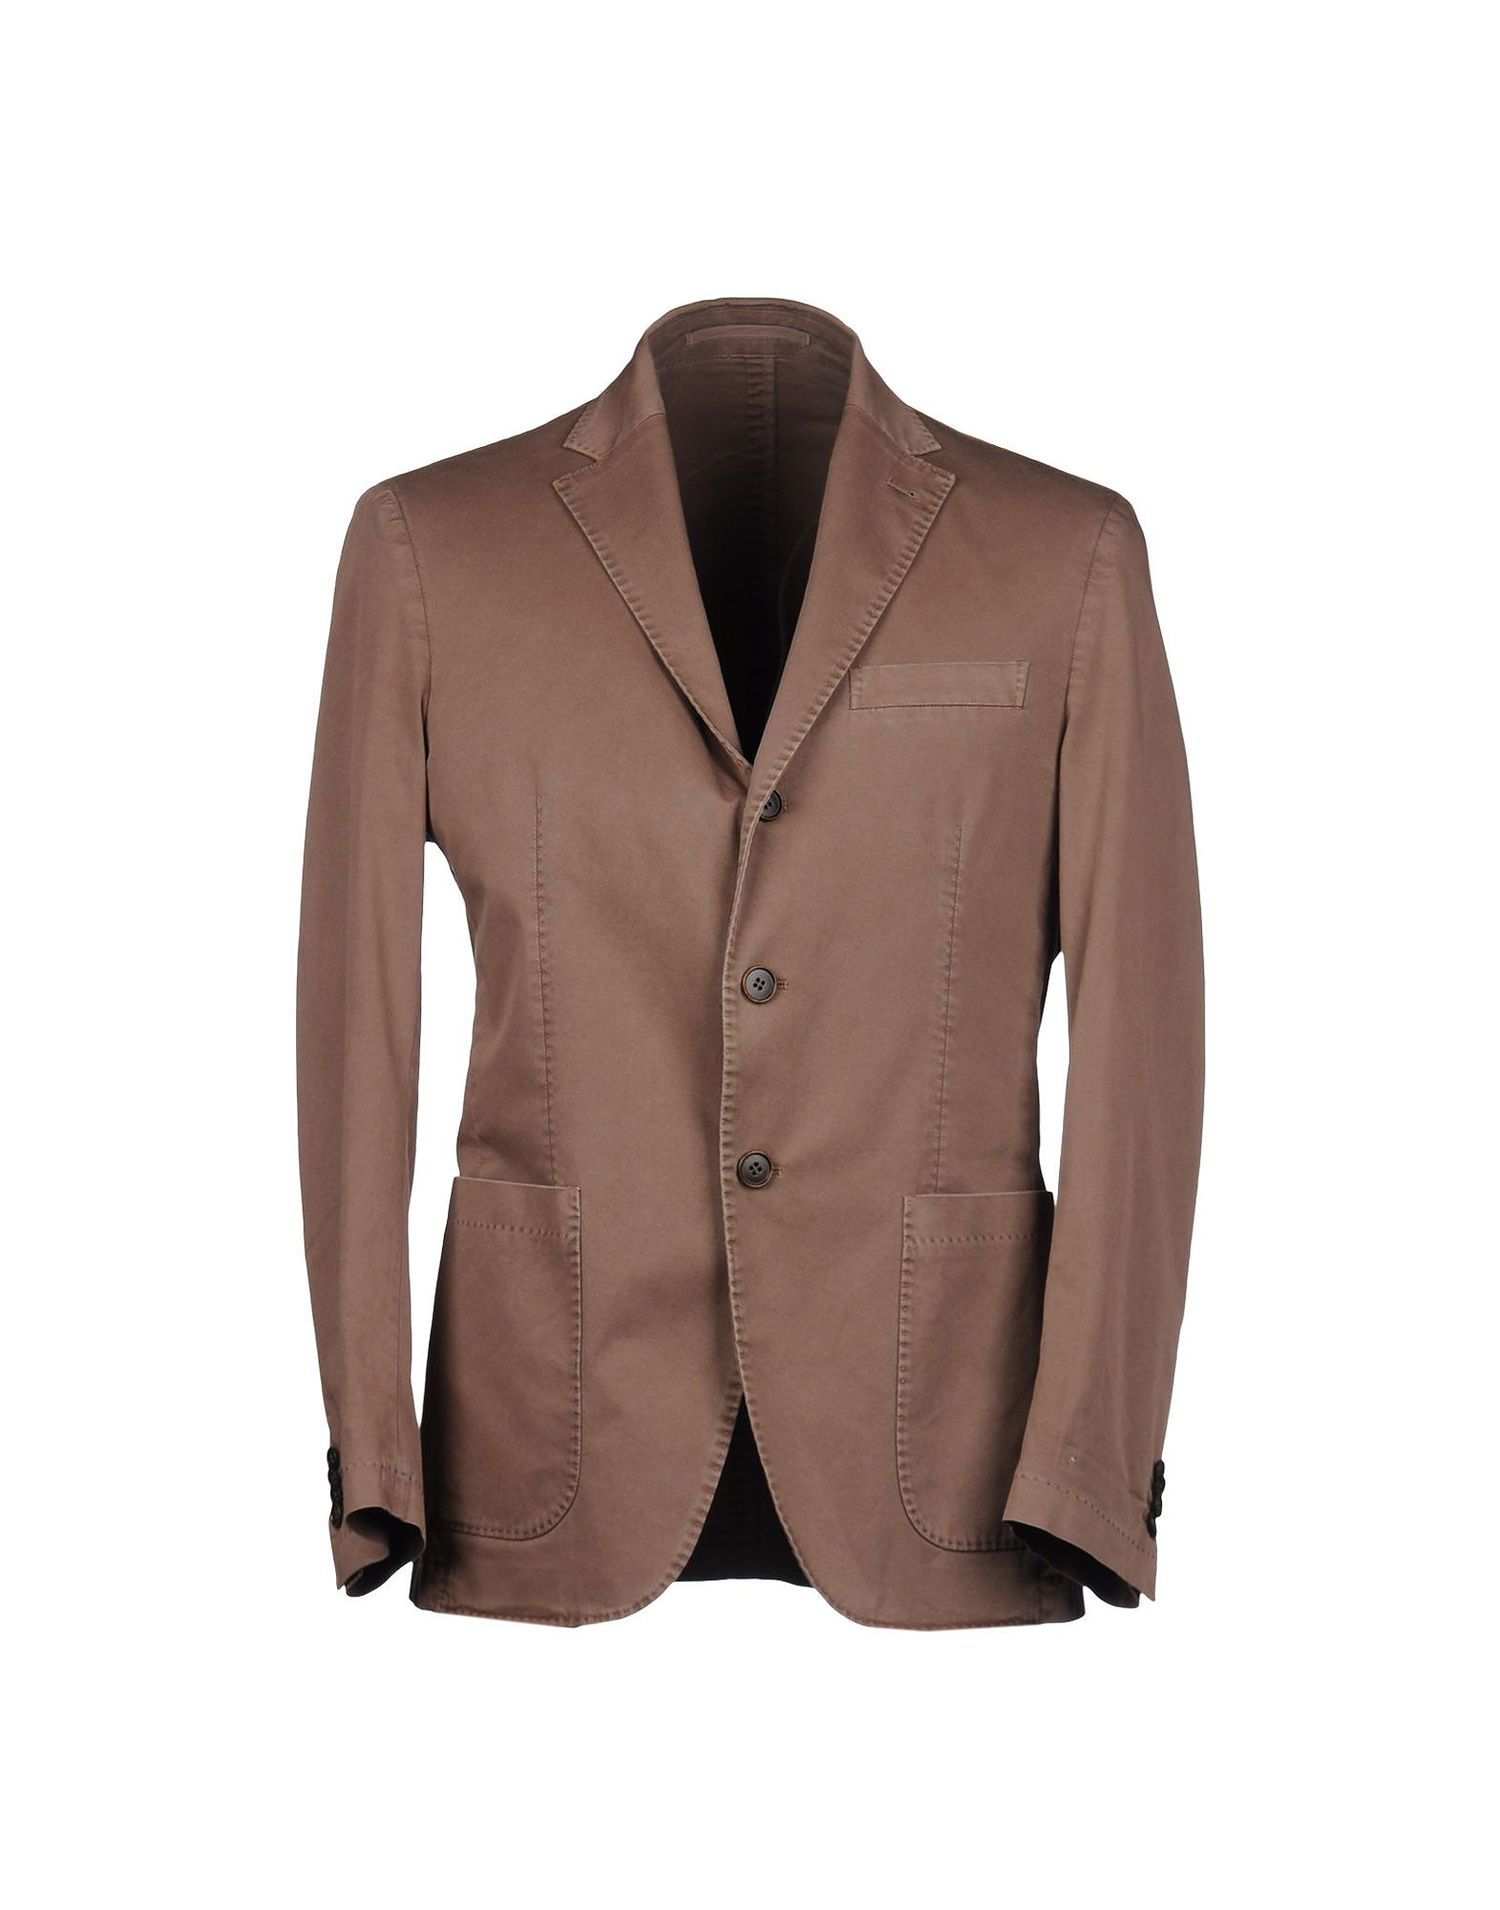 Cotton Linen Blazer Spring/summerBoglioli lMAnOK